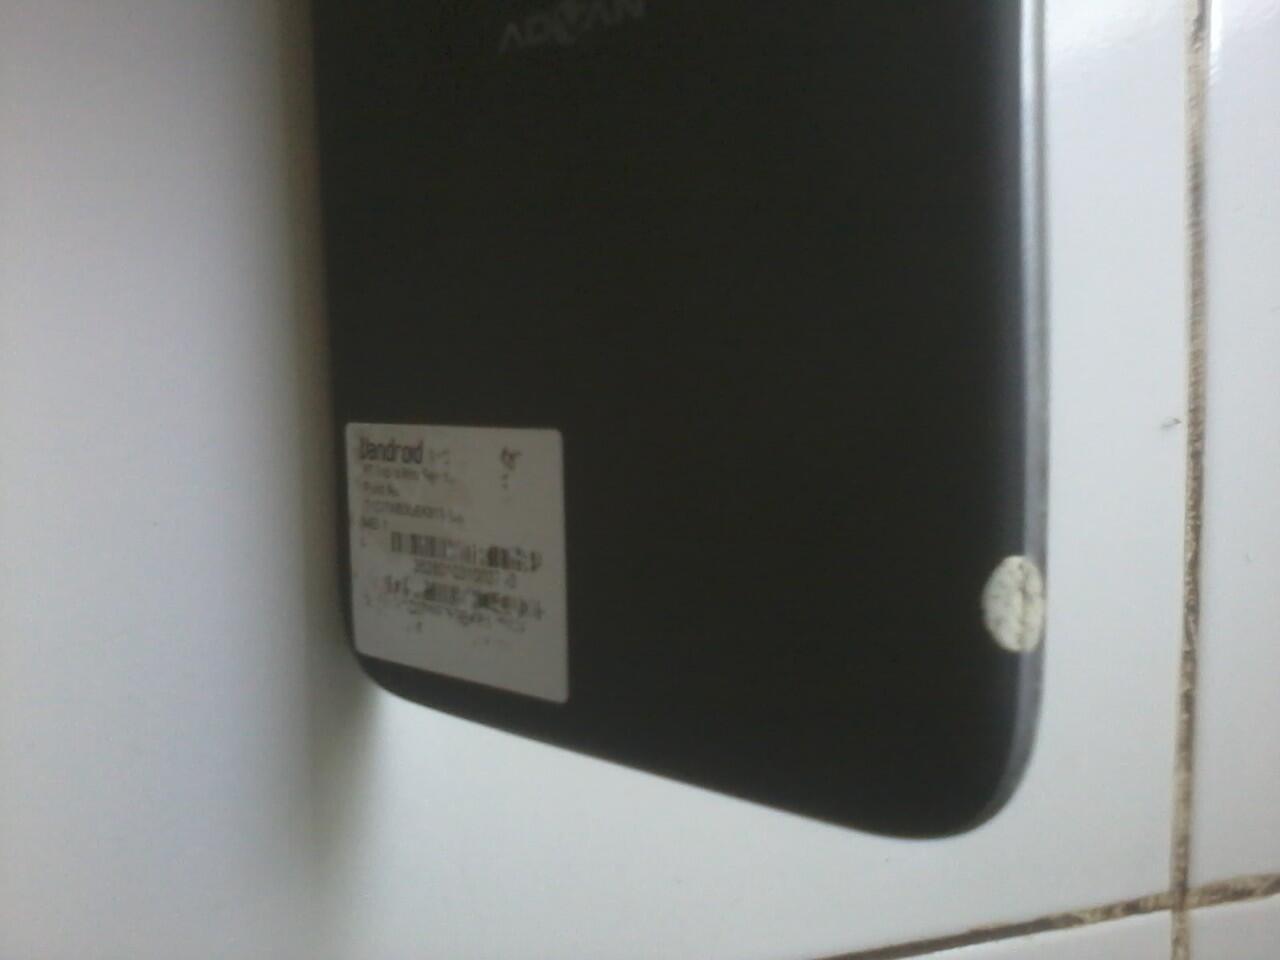 JUAL TABLET ADVAN T1Ci GSM BISA BBM